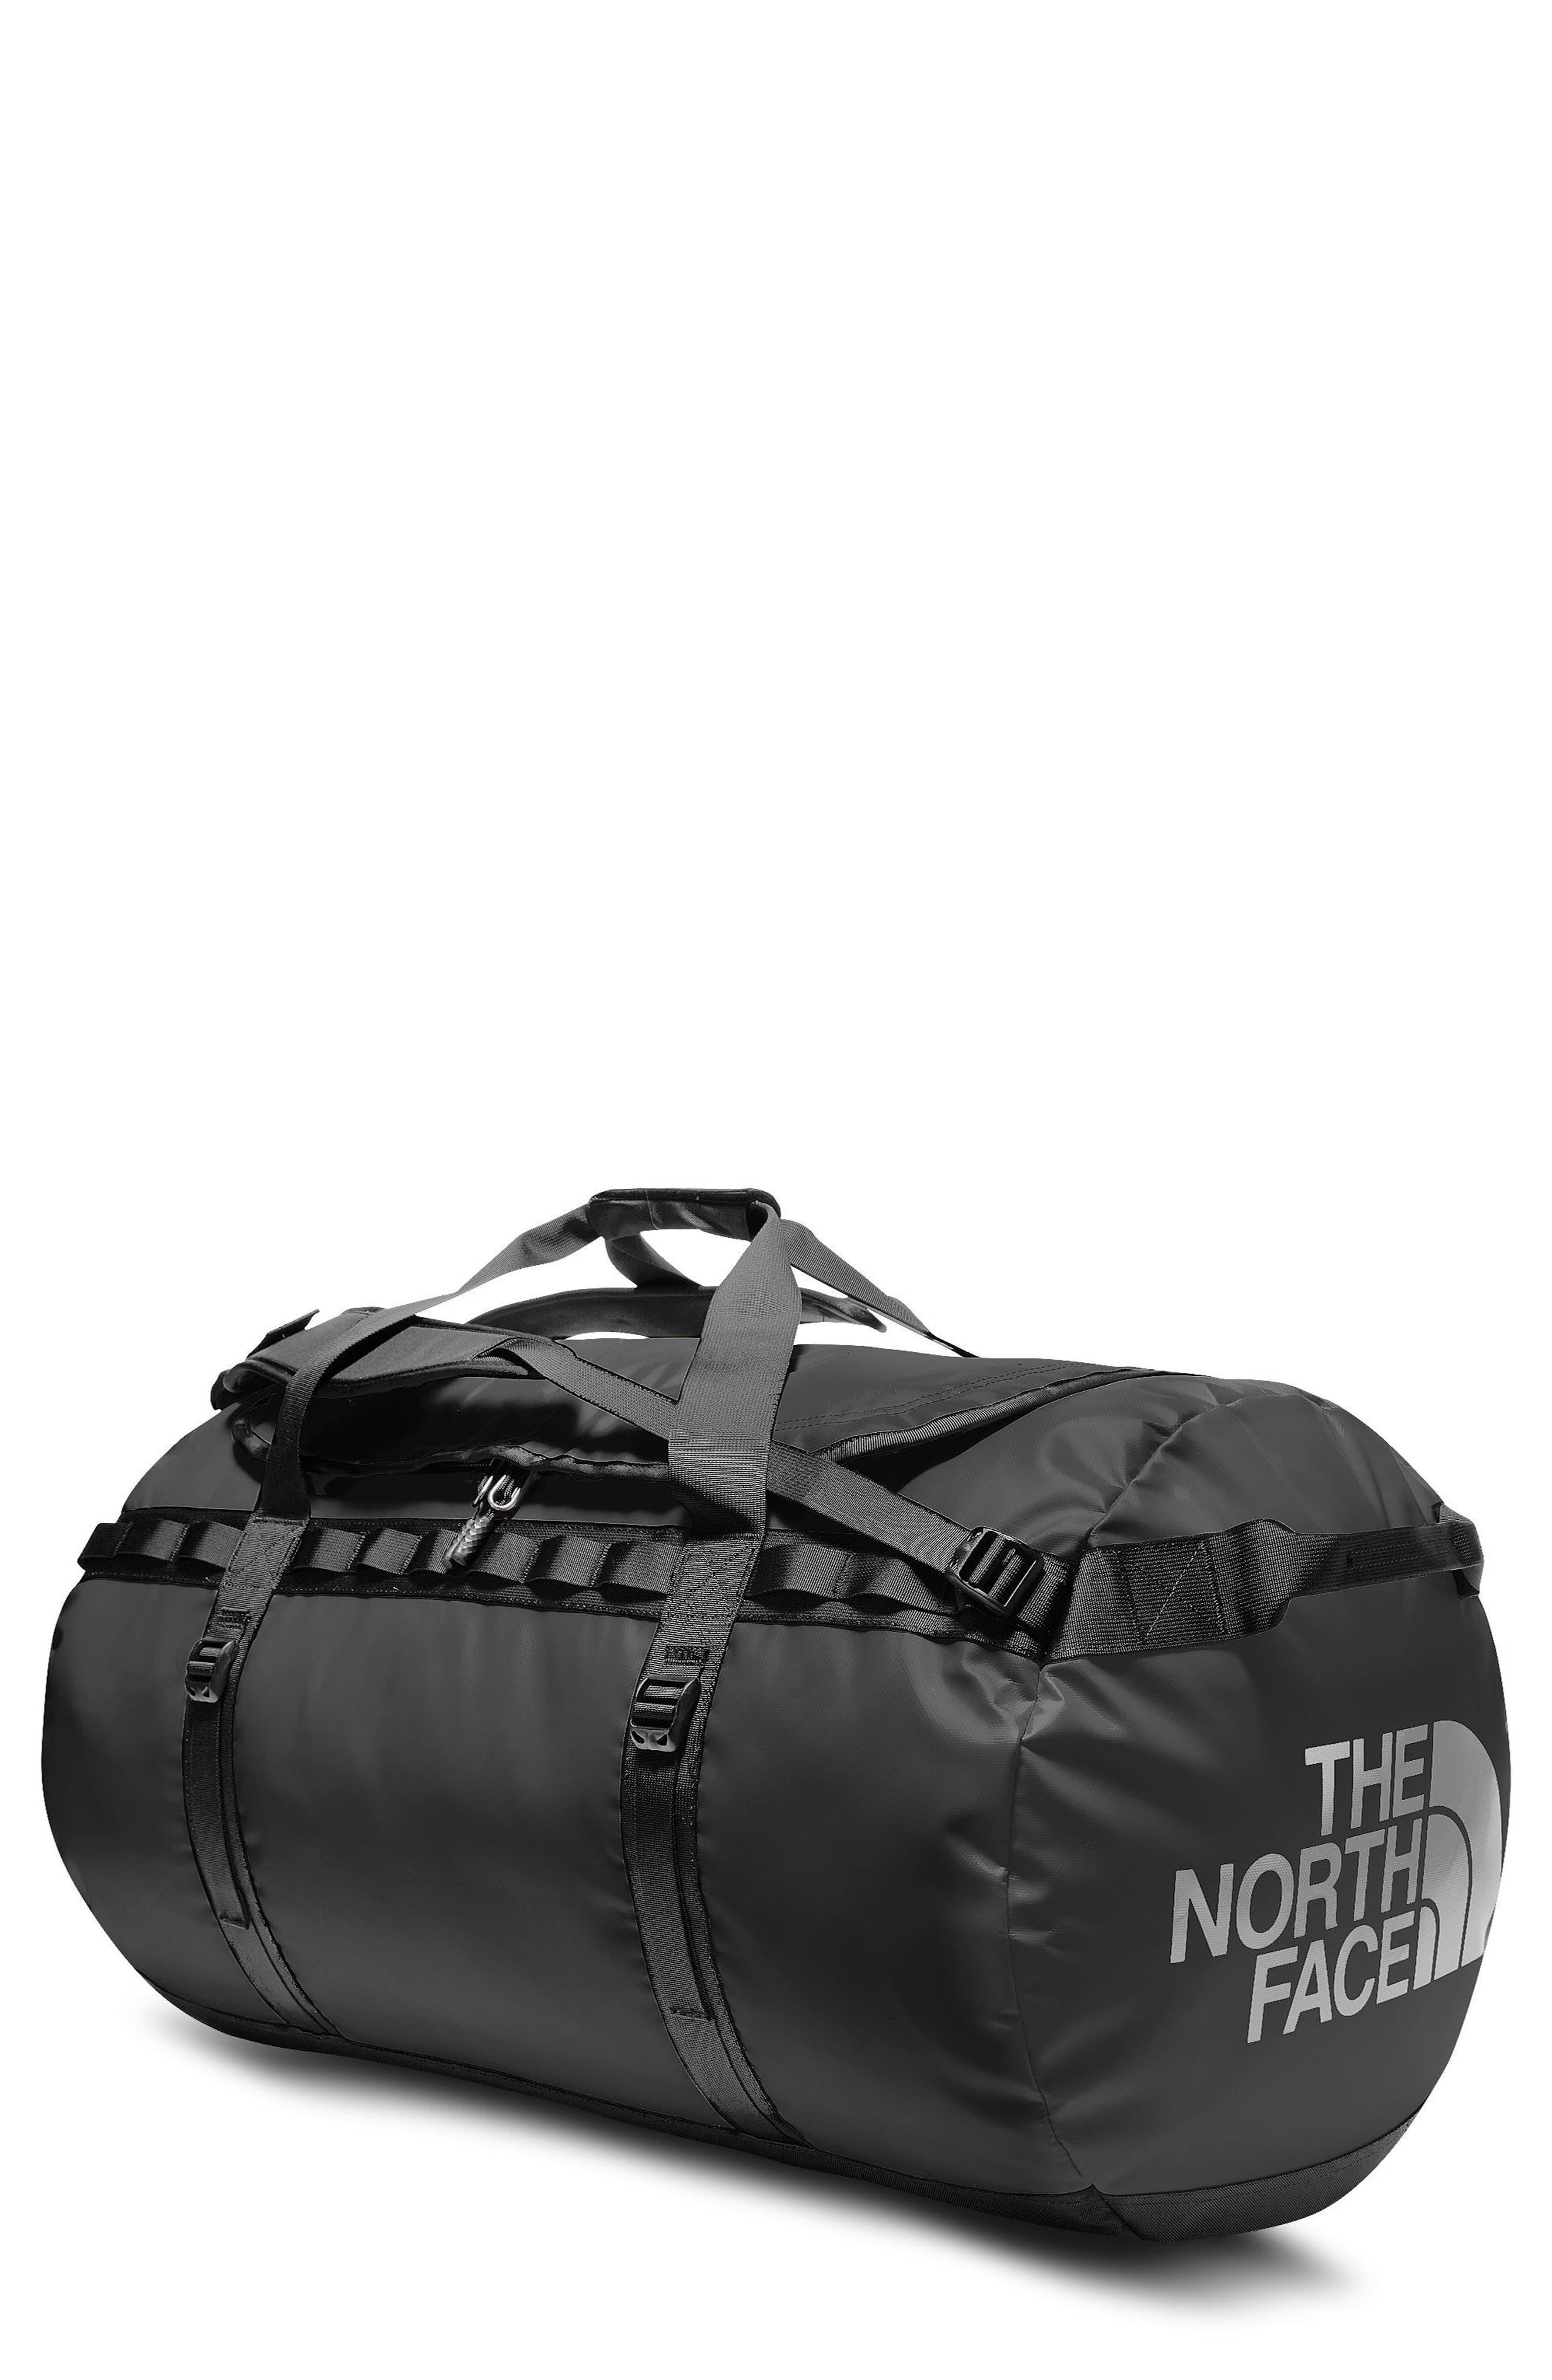 Base Camp XL Duffel Bag,                             Main thumbnail 1, color,                             Tnf Black